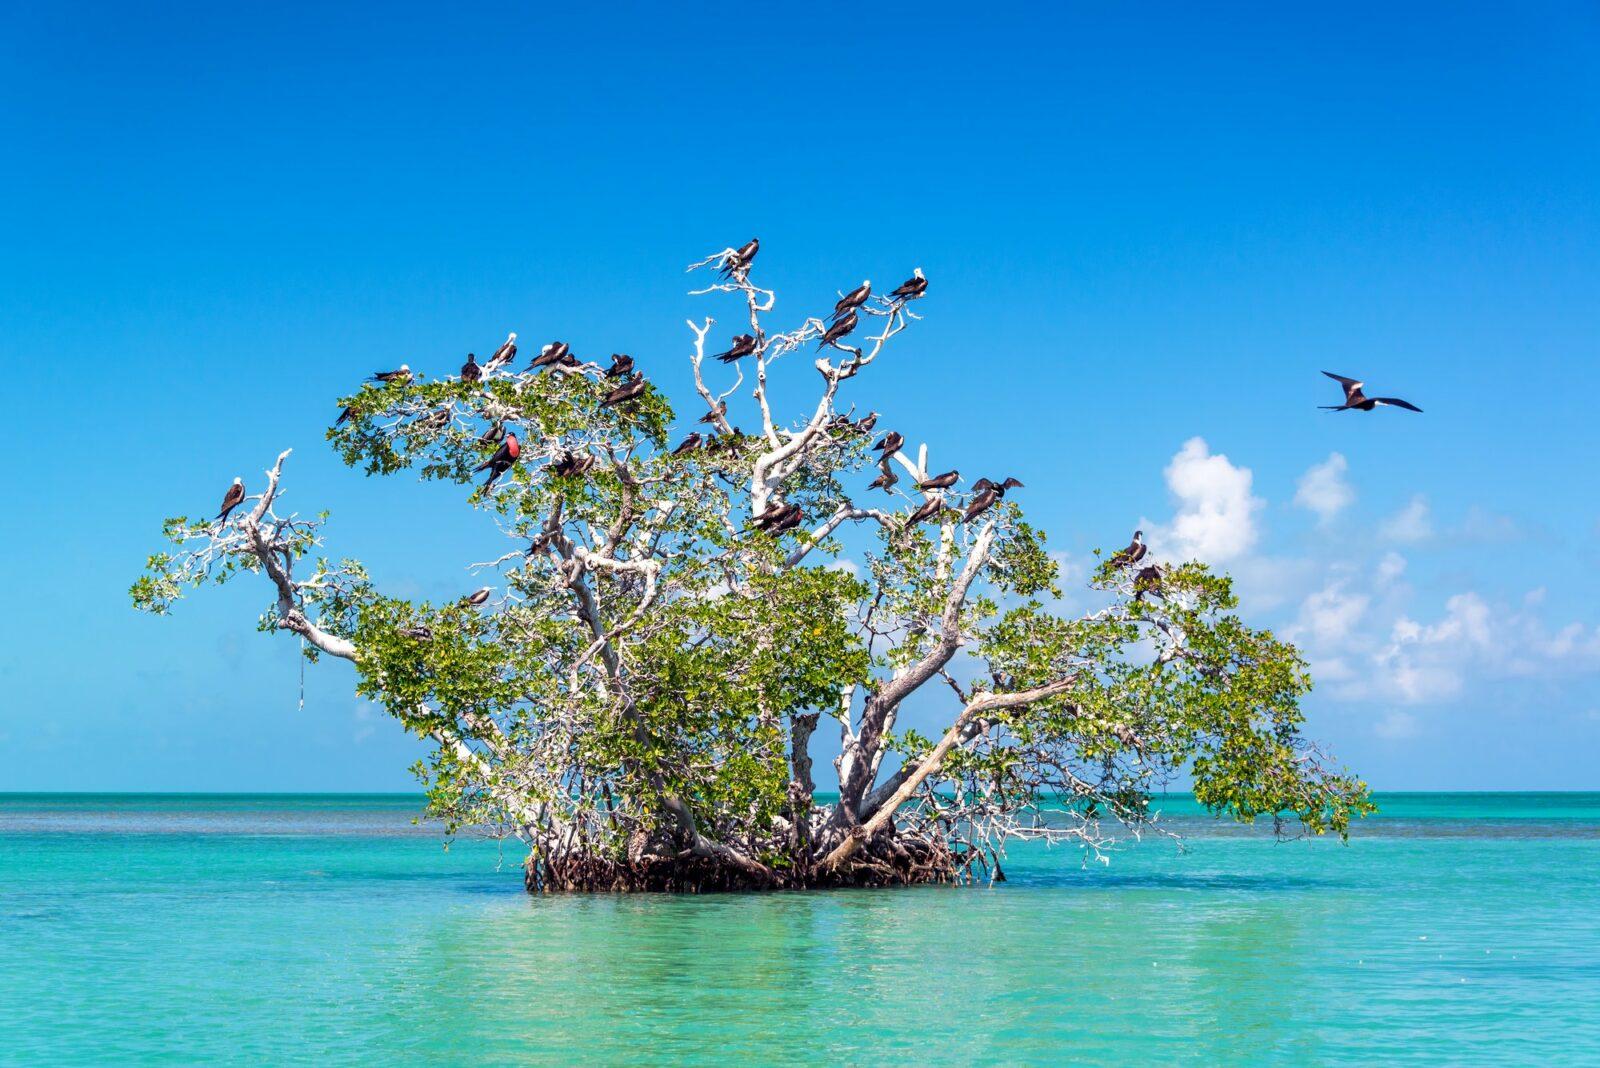 Mangrove Tree and Frigatebirds